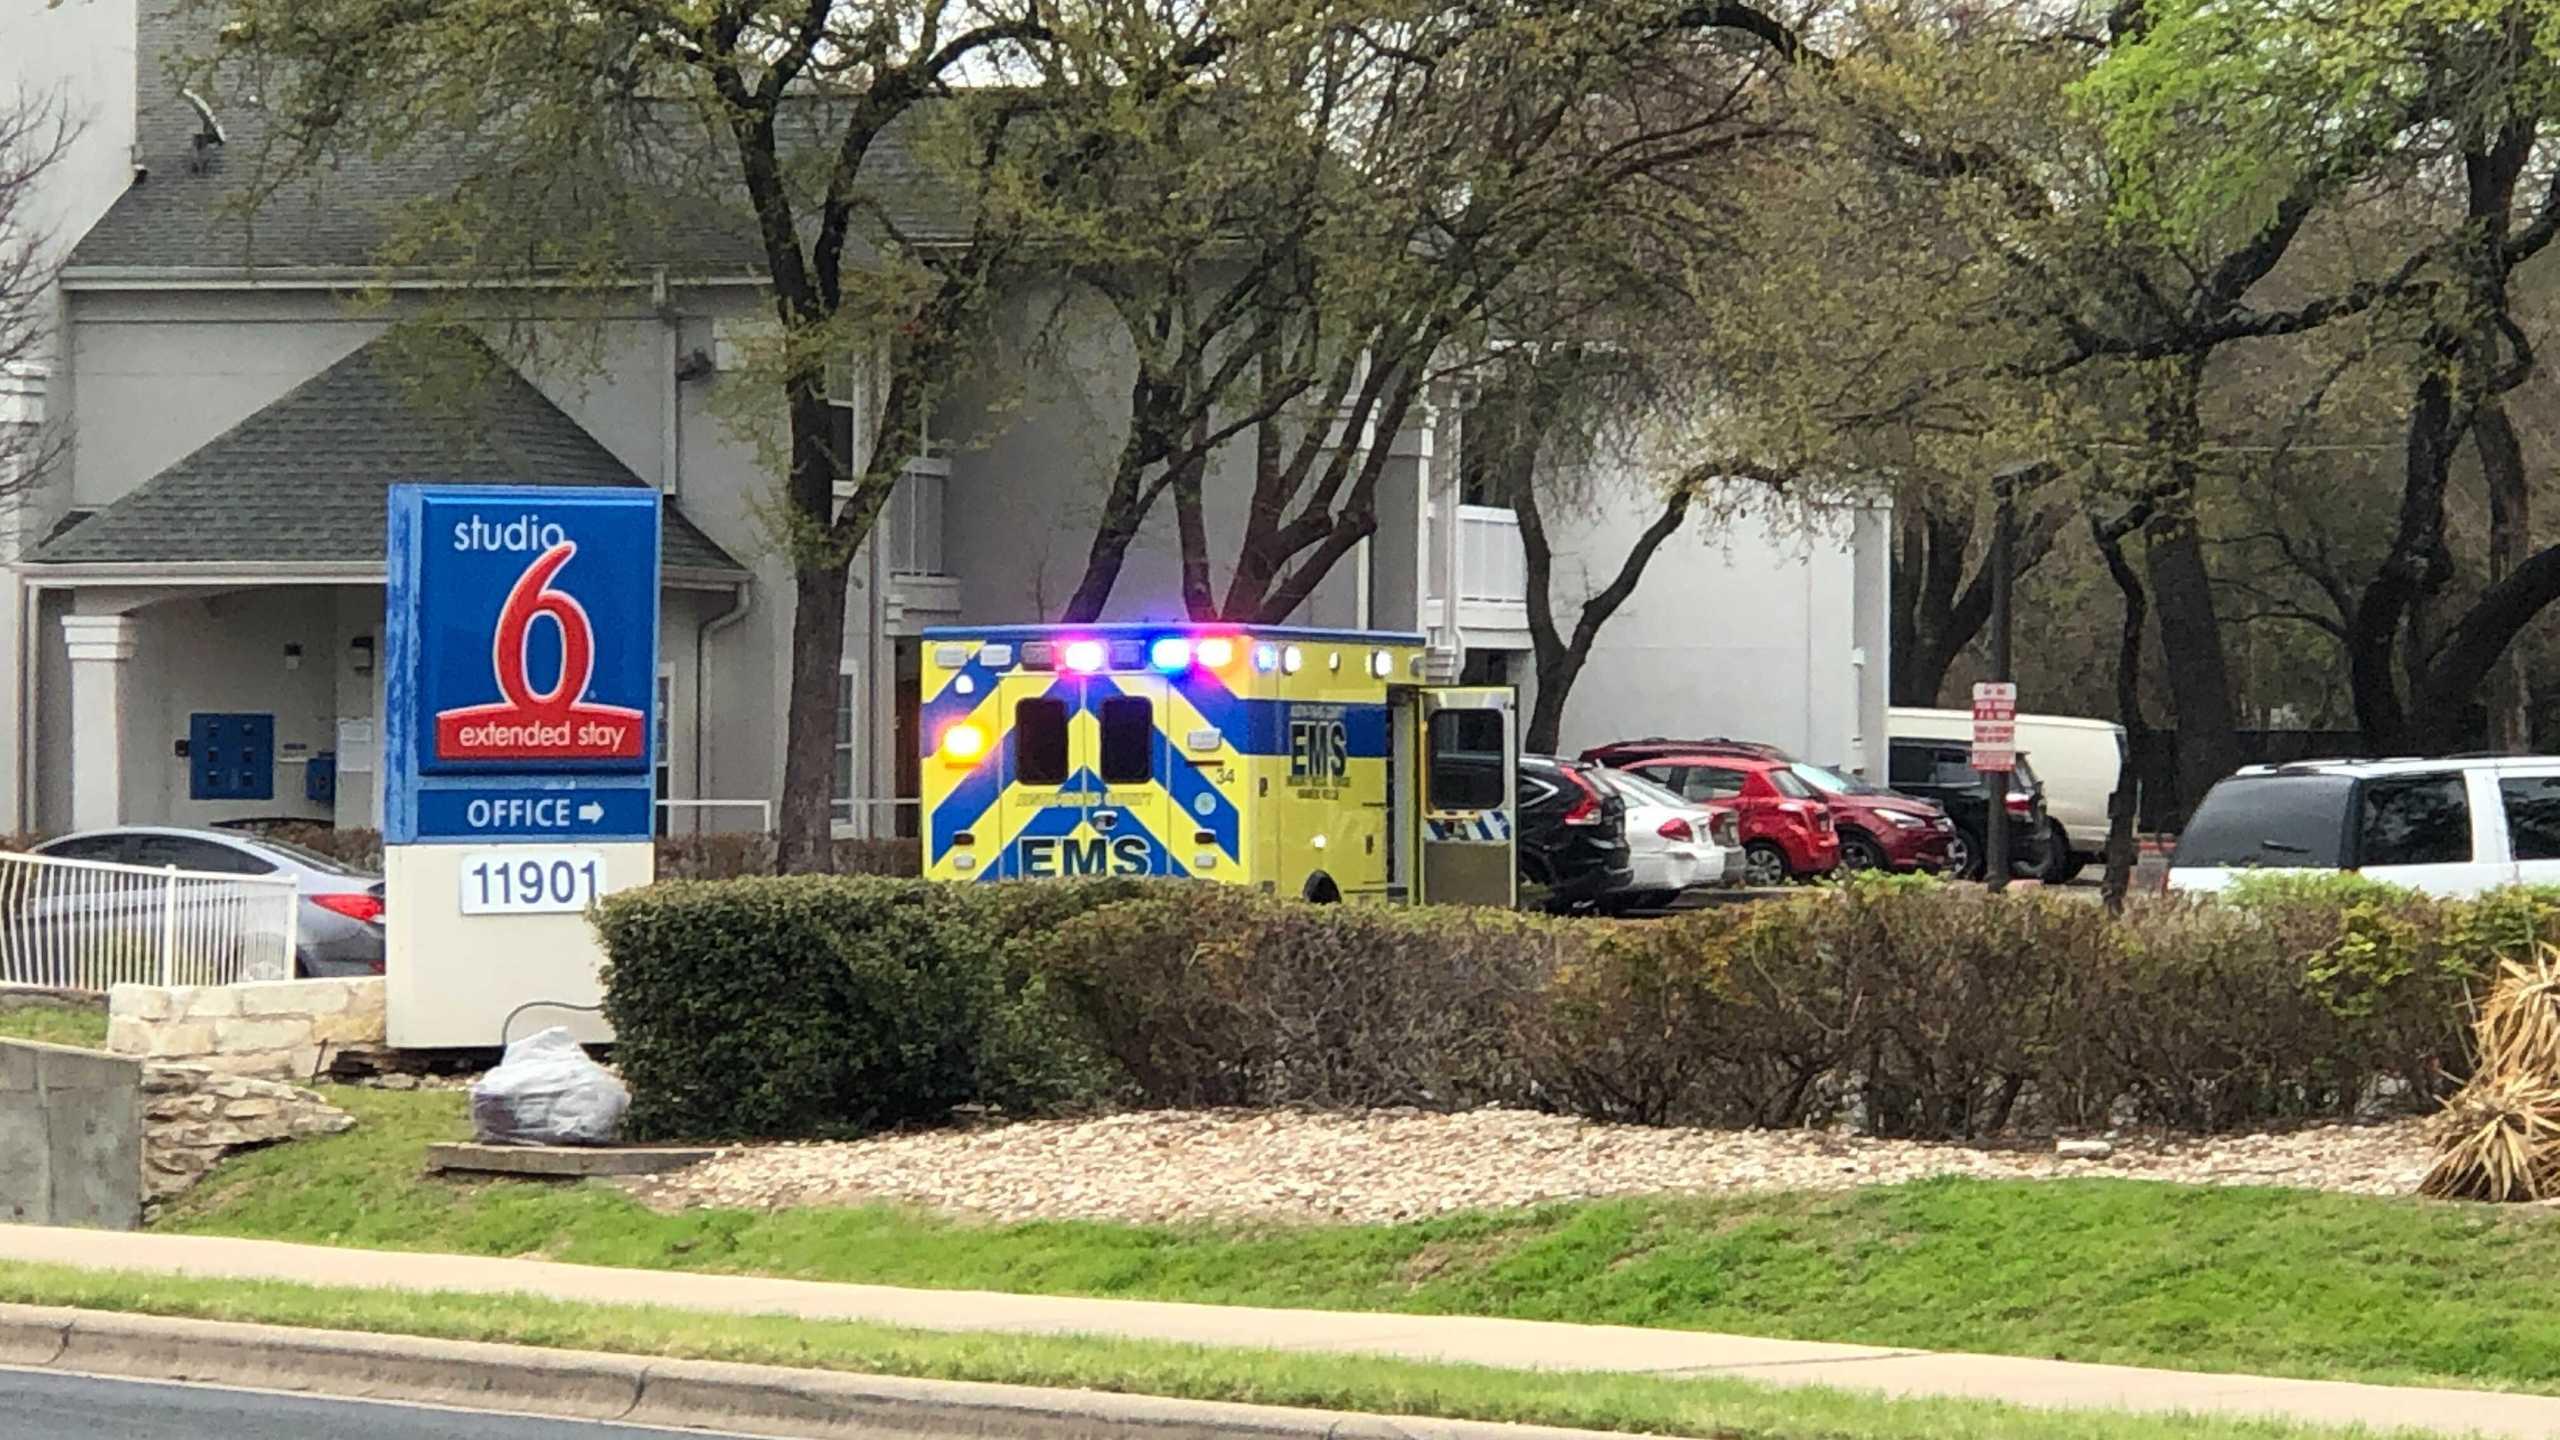 Scene of shooting in northwest Austin on Pavilion Boulevard March 22, 2021 (KXAN/Frank Martinez)